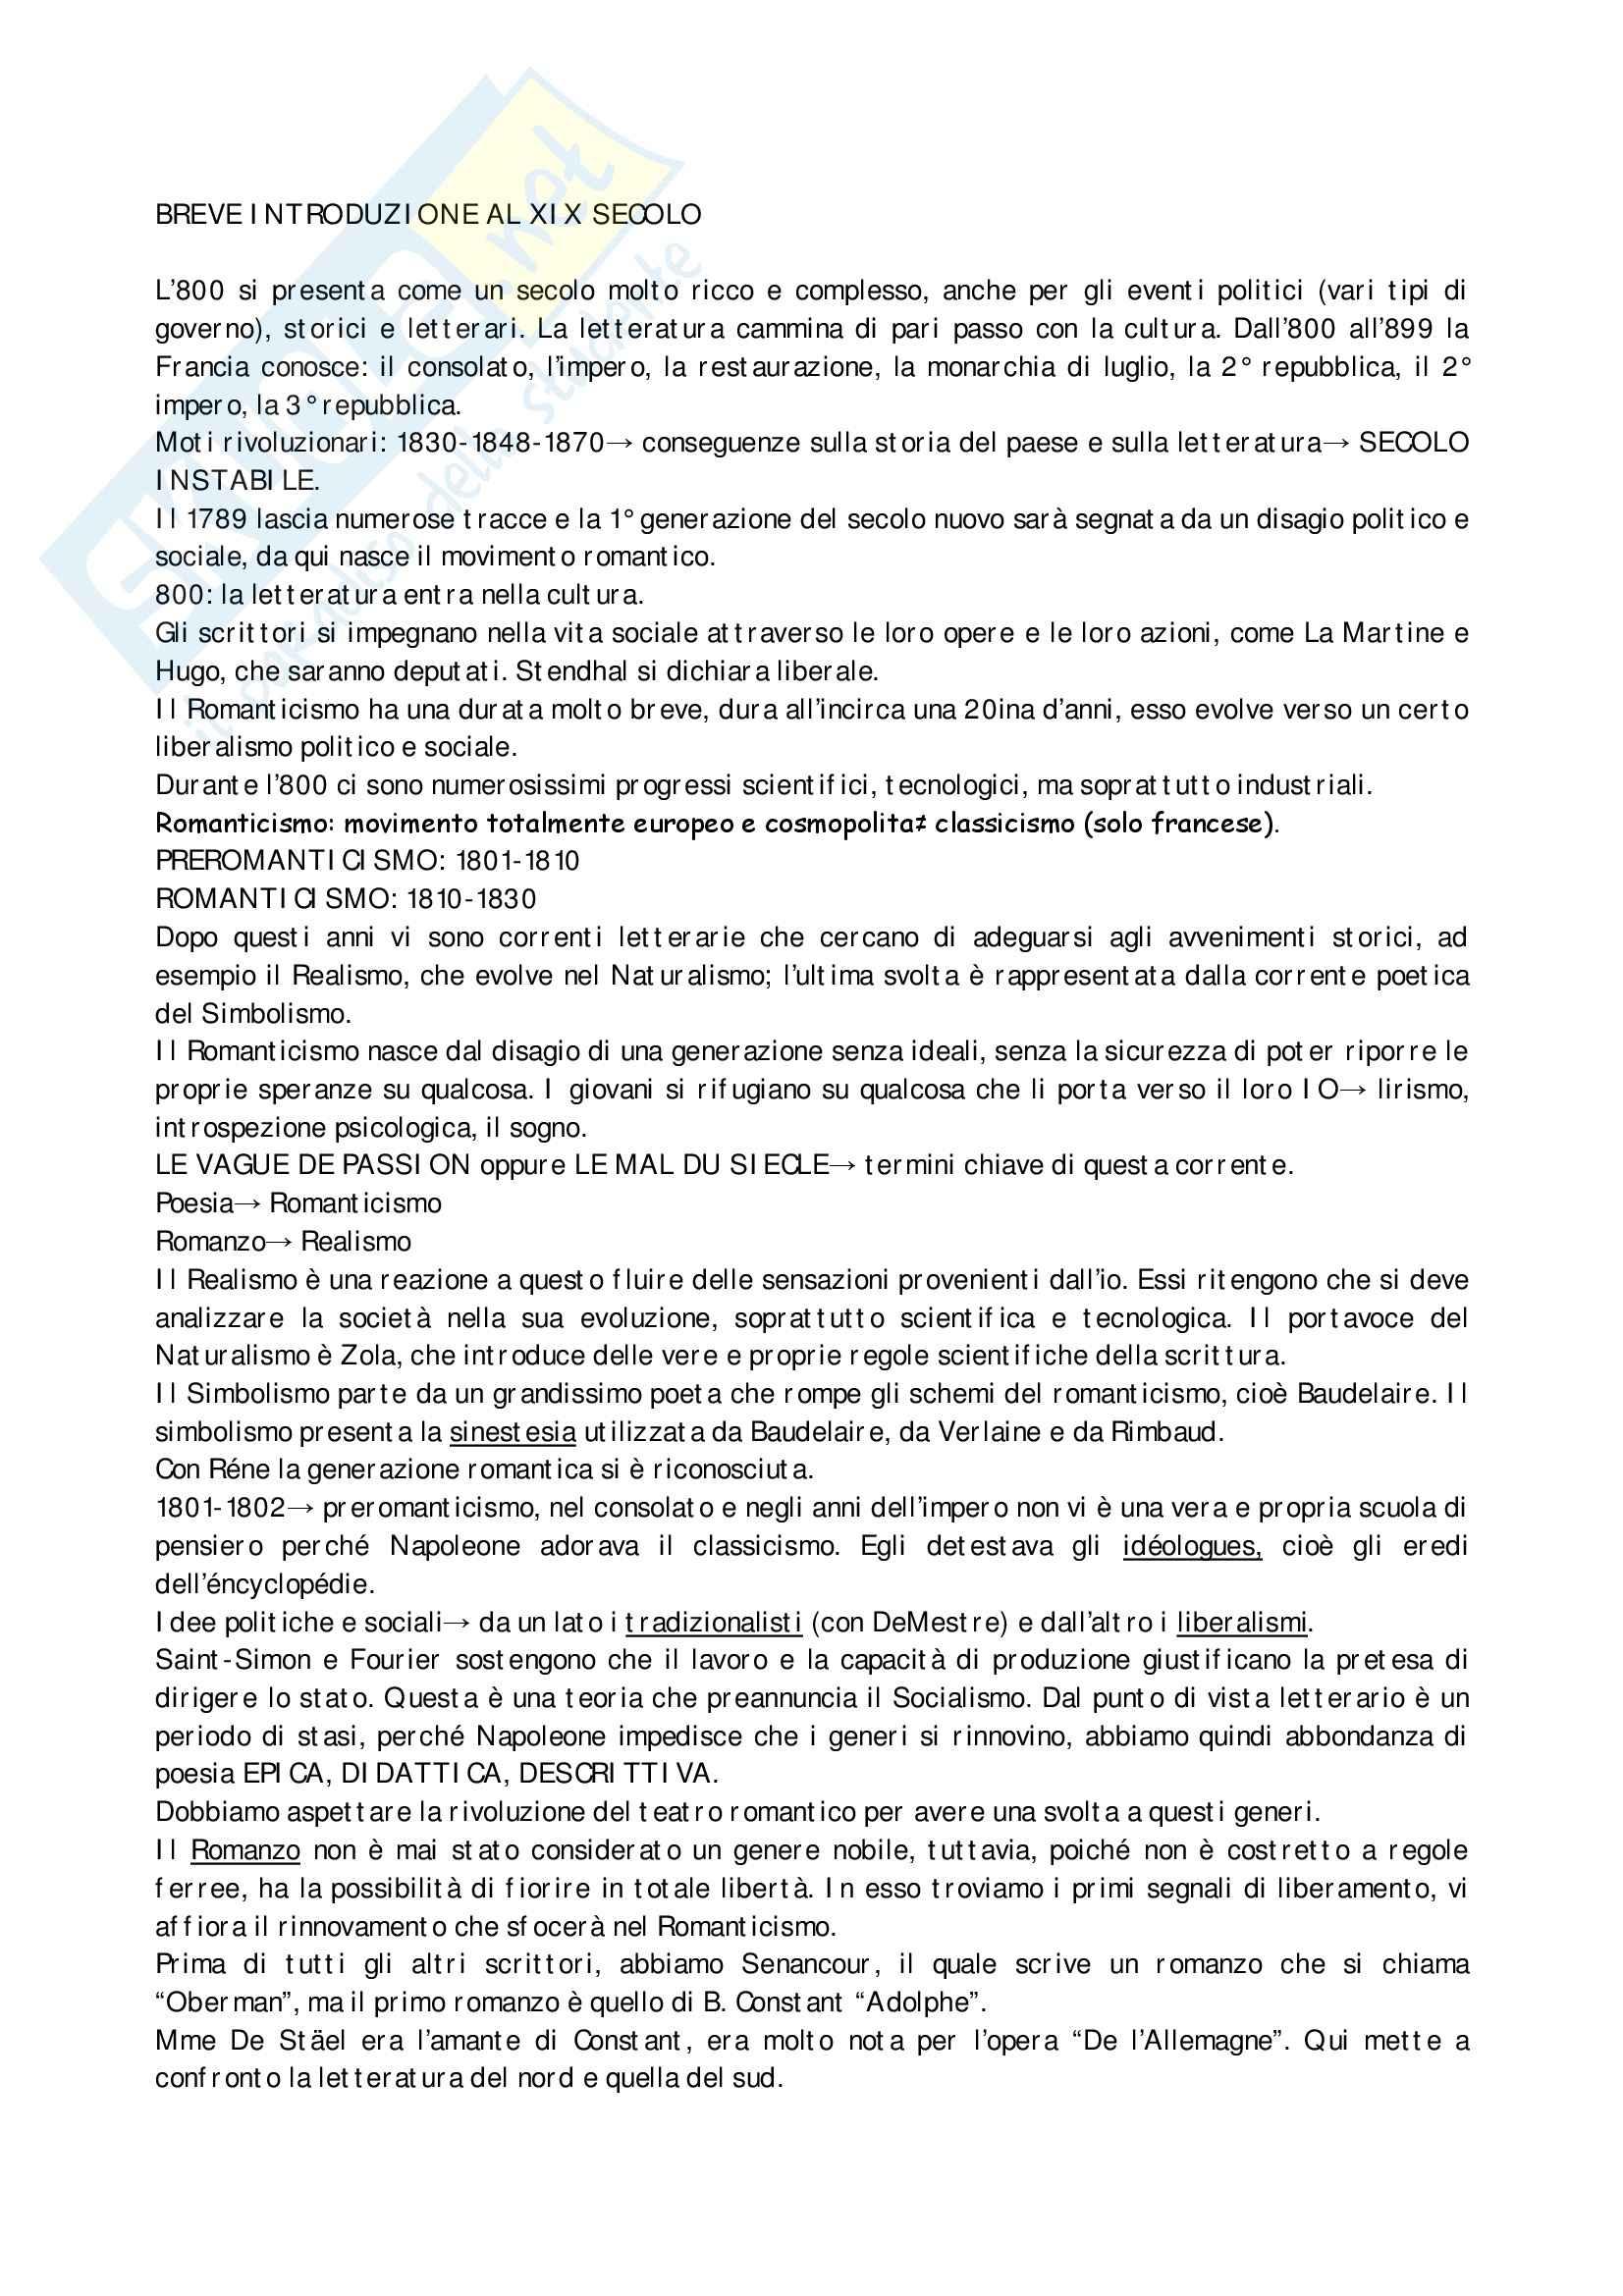 Letteratura francese 800-900 - Appunti